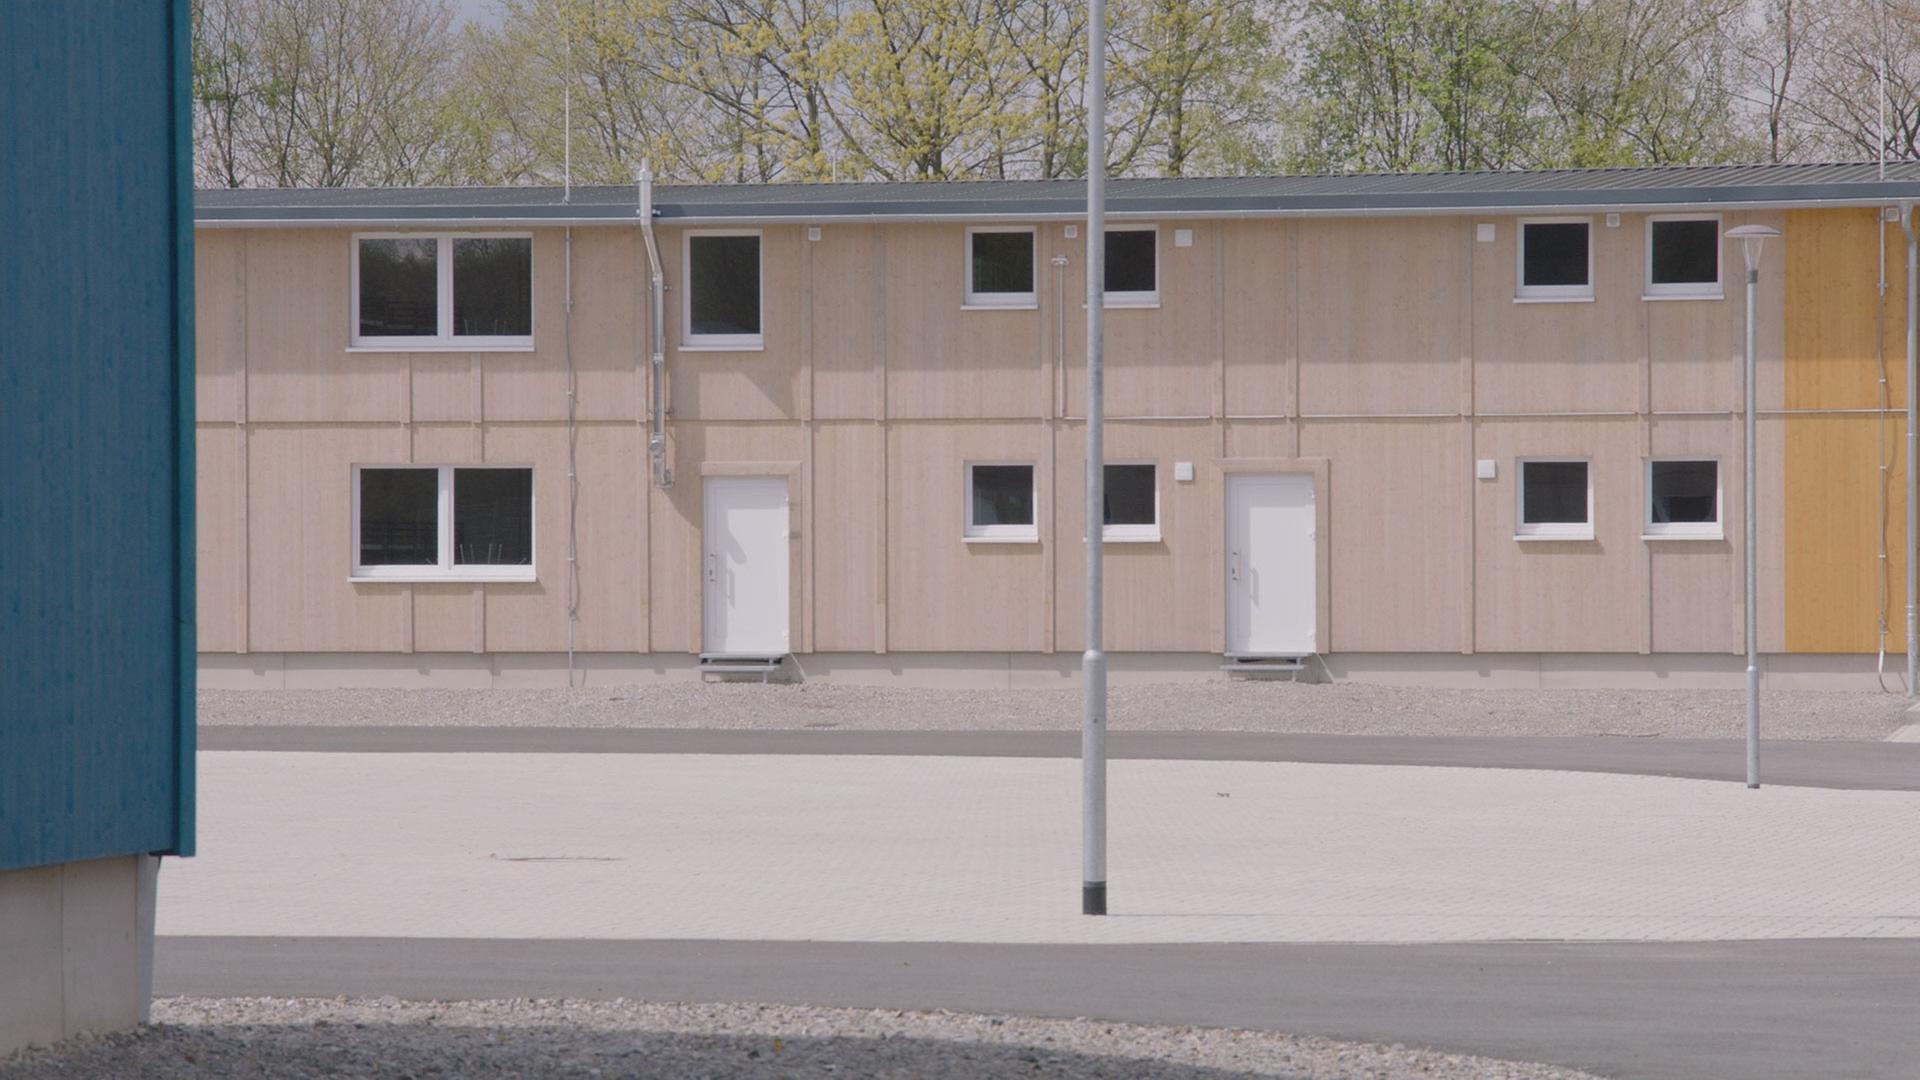 Fassade frontal textur  Frontal 21 - ZDFmediathek